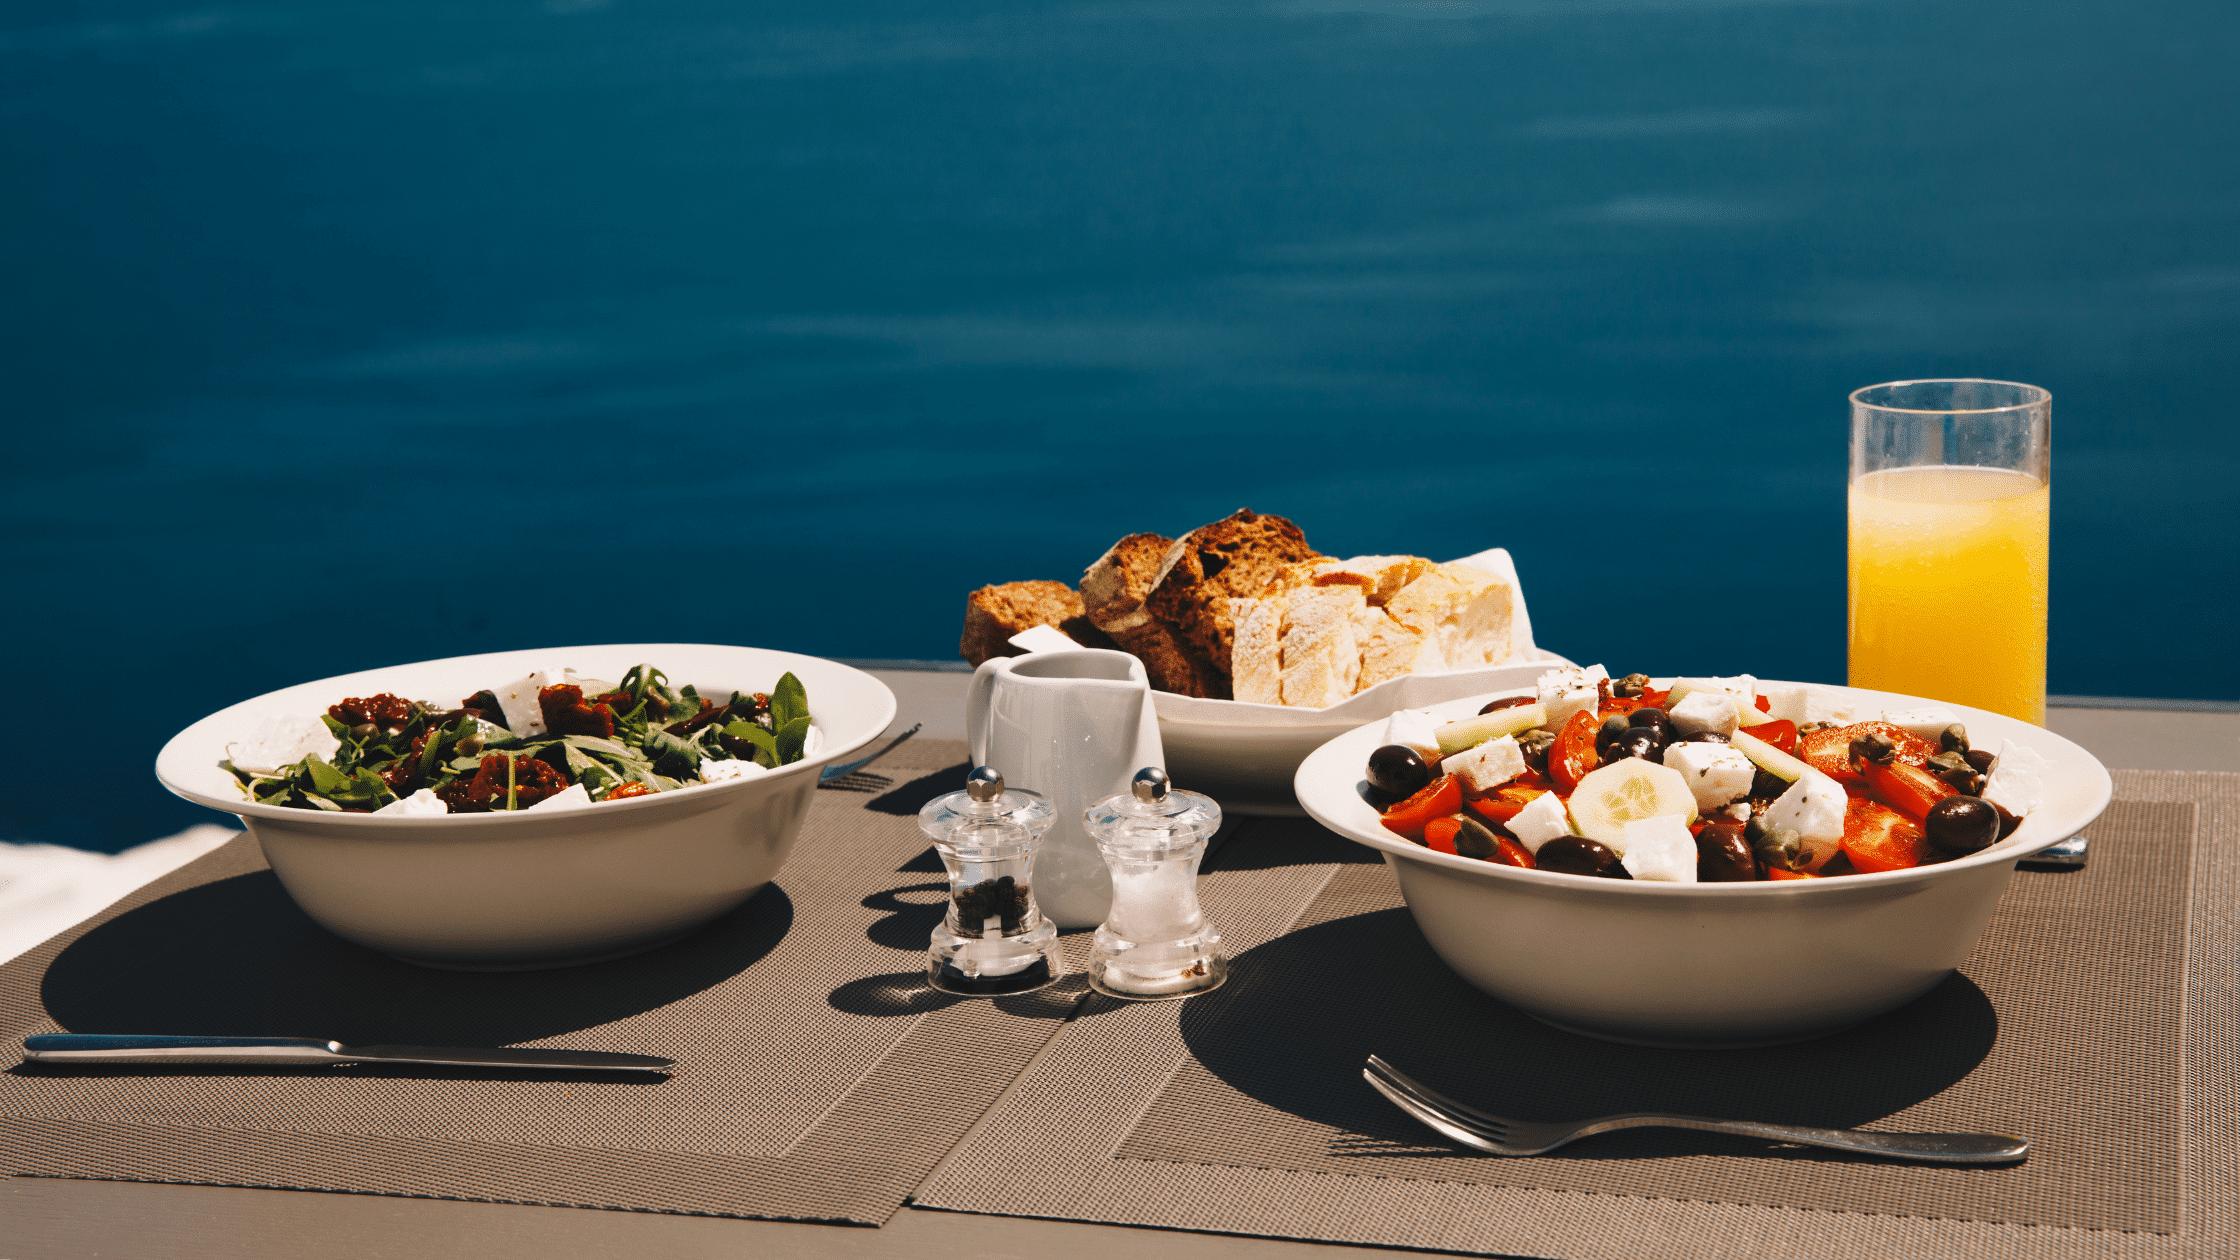 Food on table next to pool